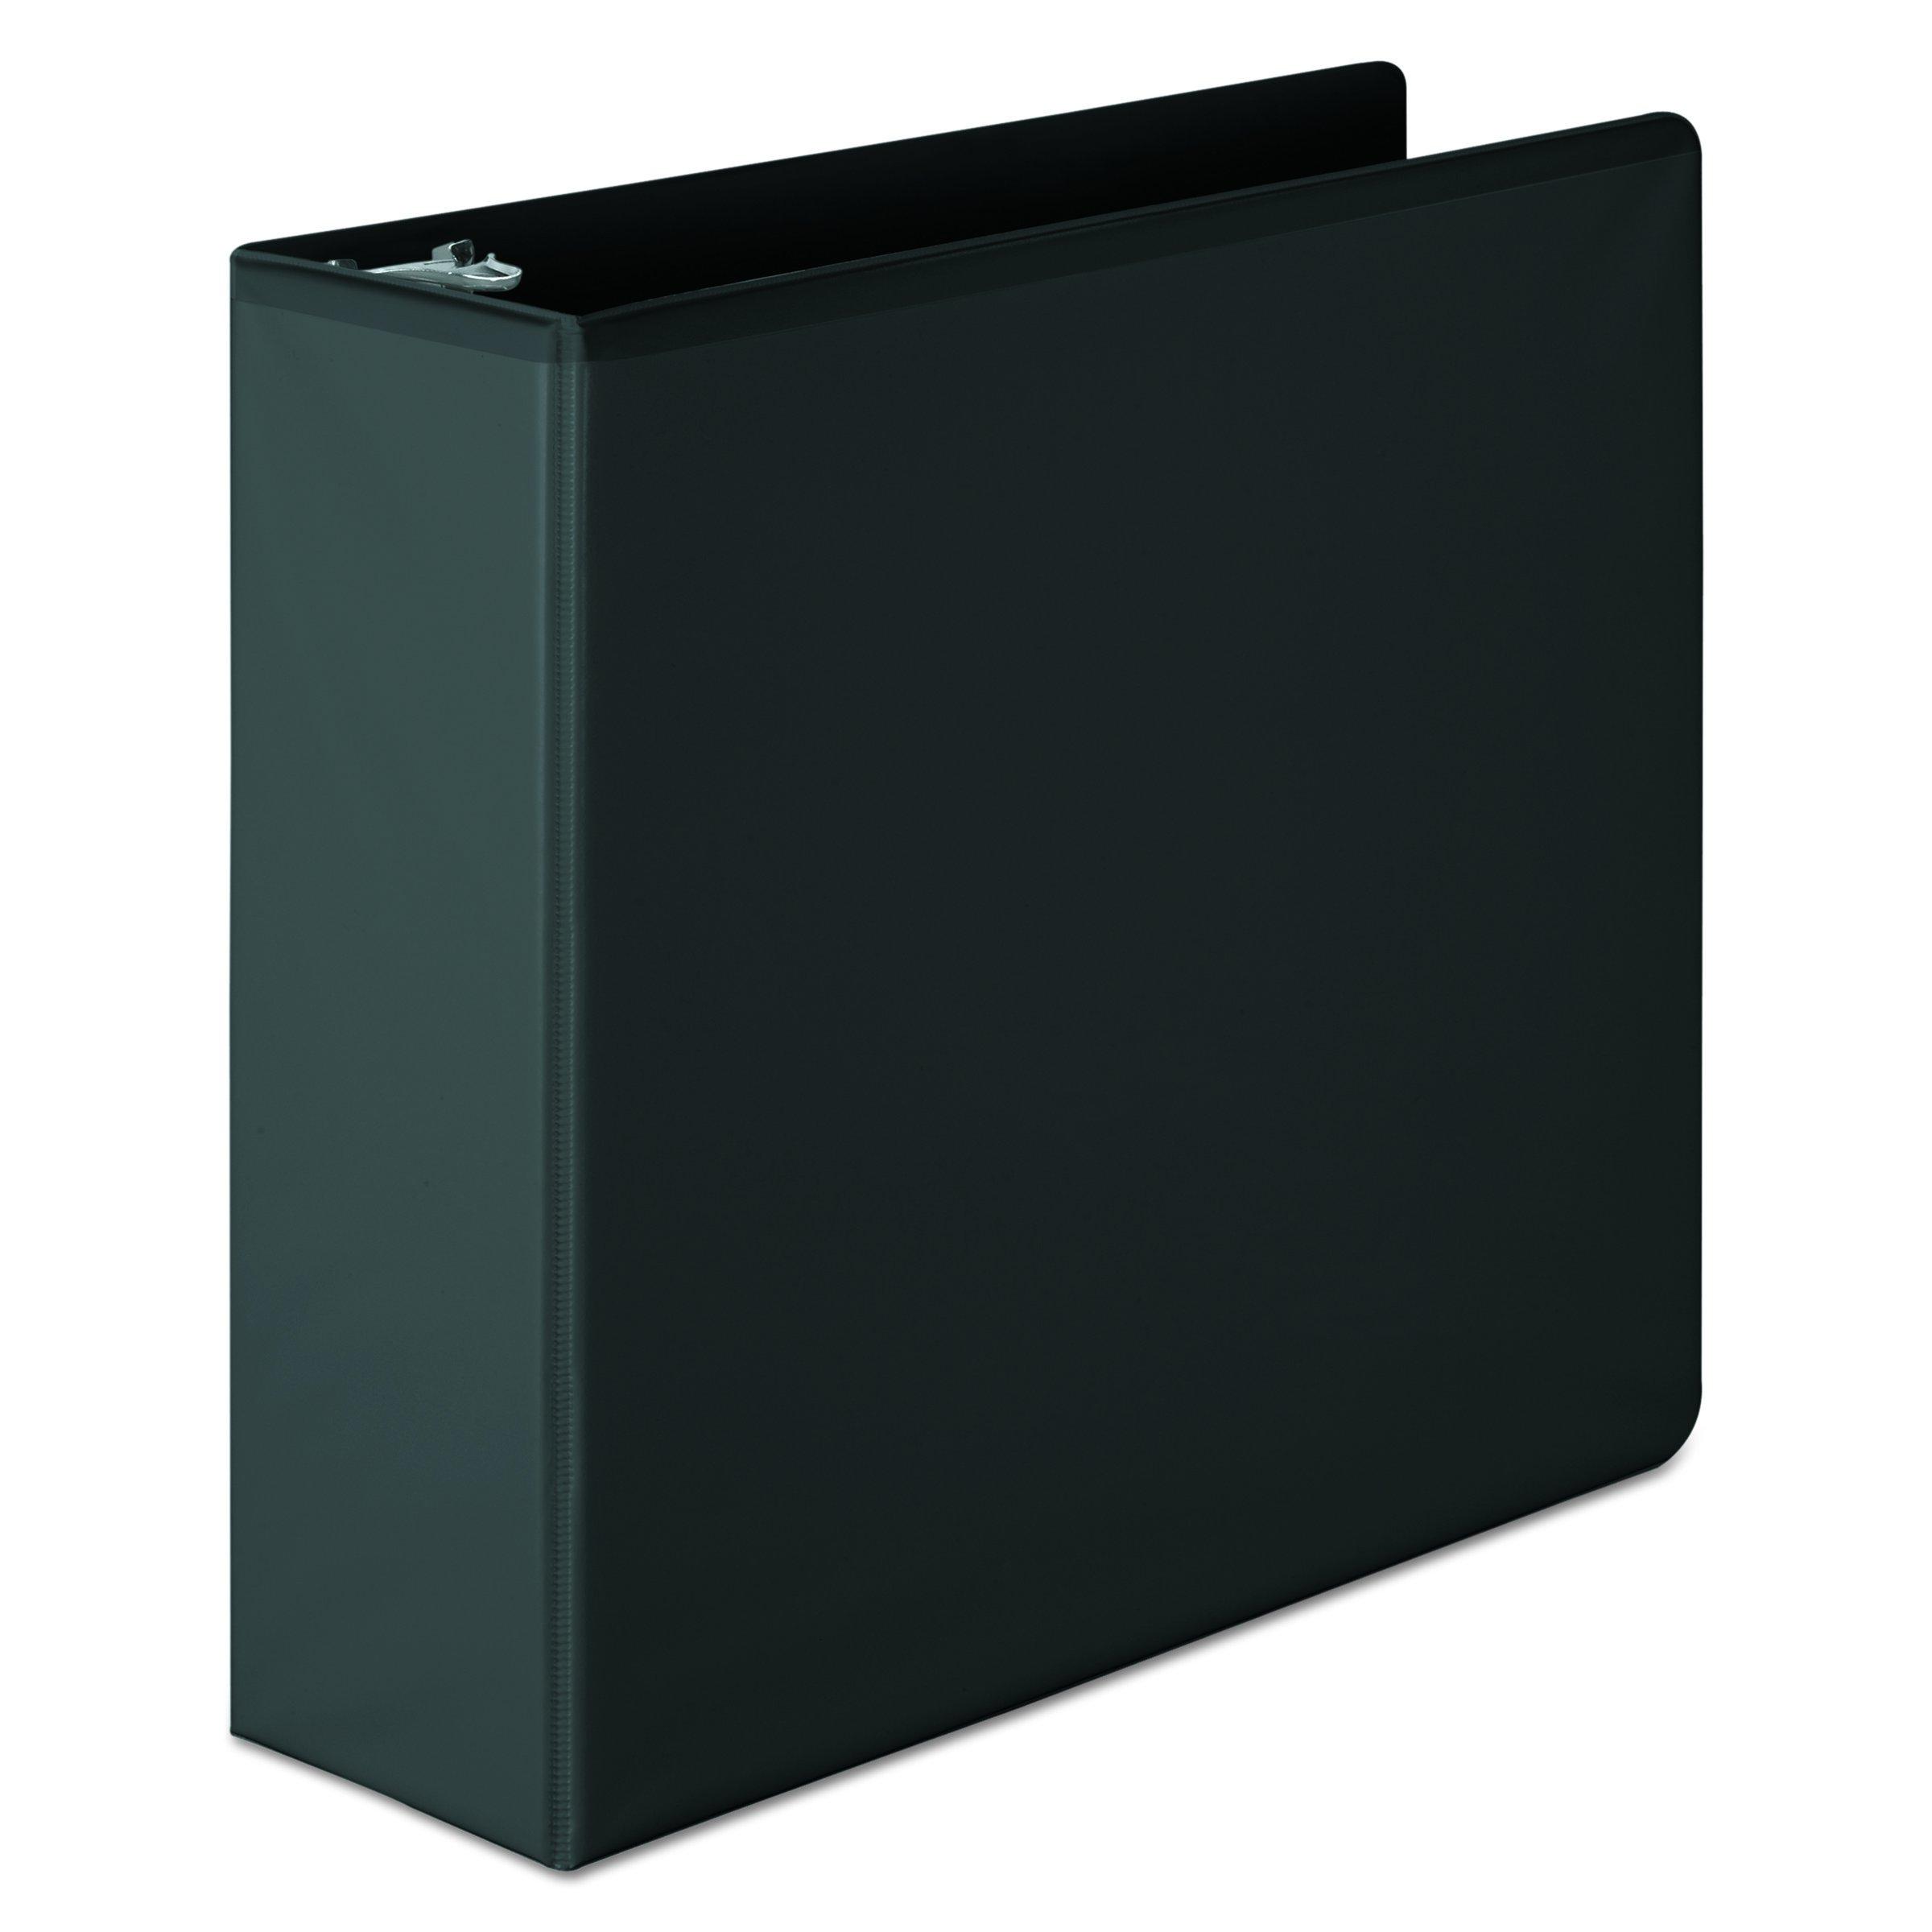 Wilson Jones 3 Inch 3 Ring Binder, Basic D-Ring View Binder, Black (W386-49BA)